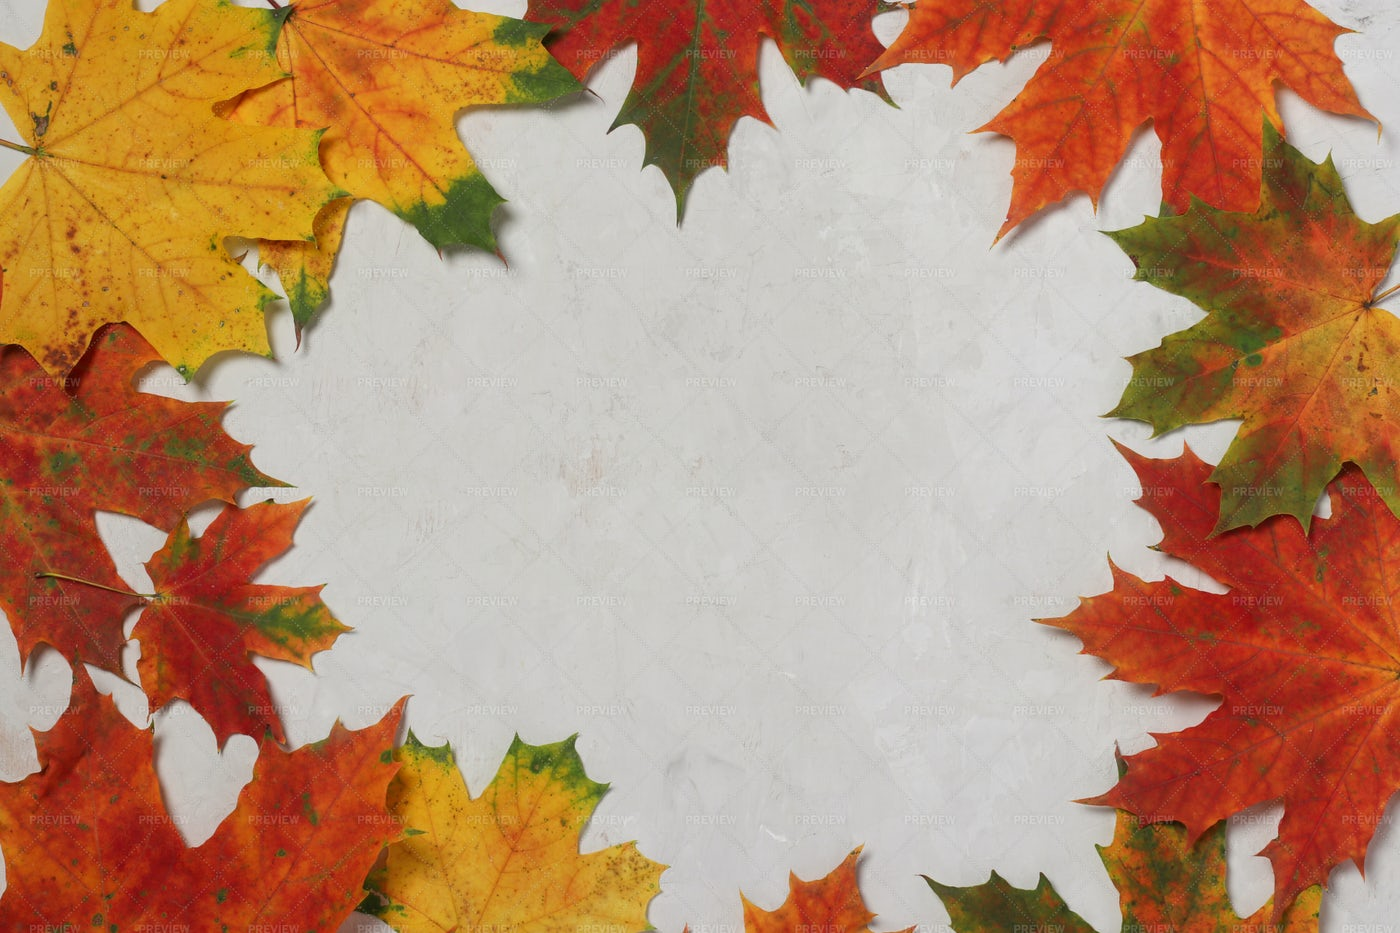 Autumn Leaves Frame: Stock Photos